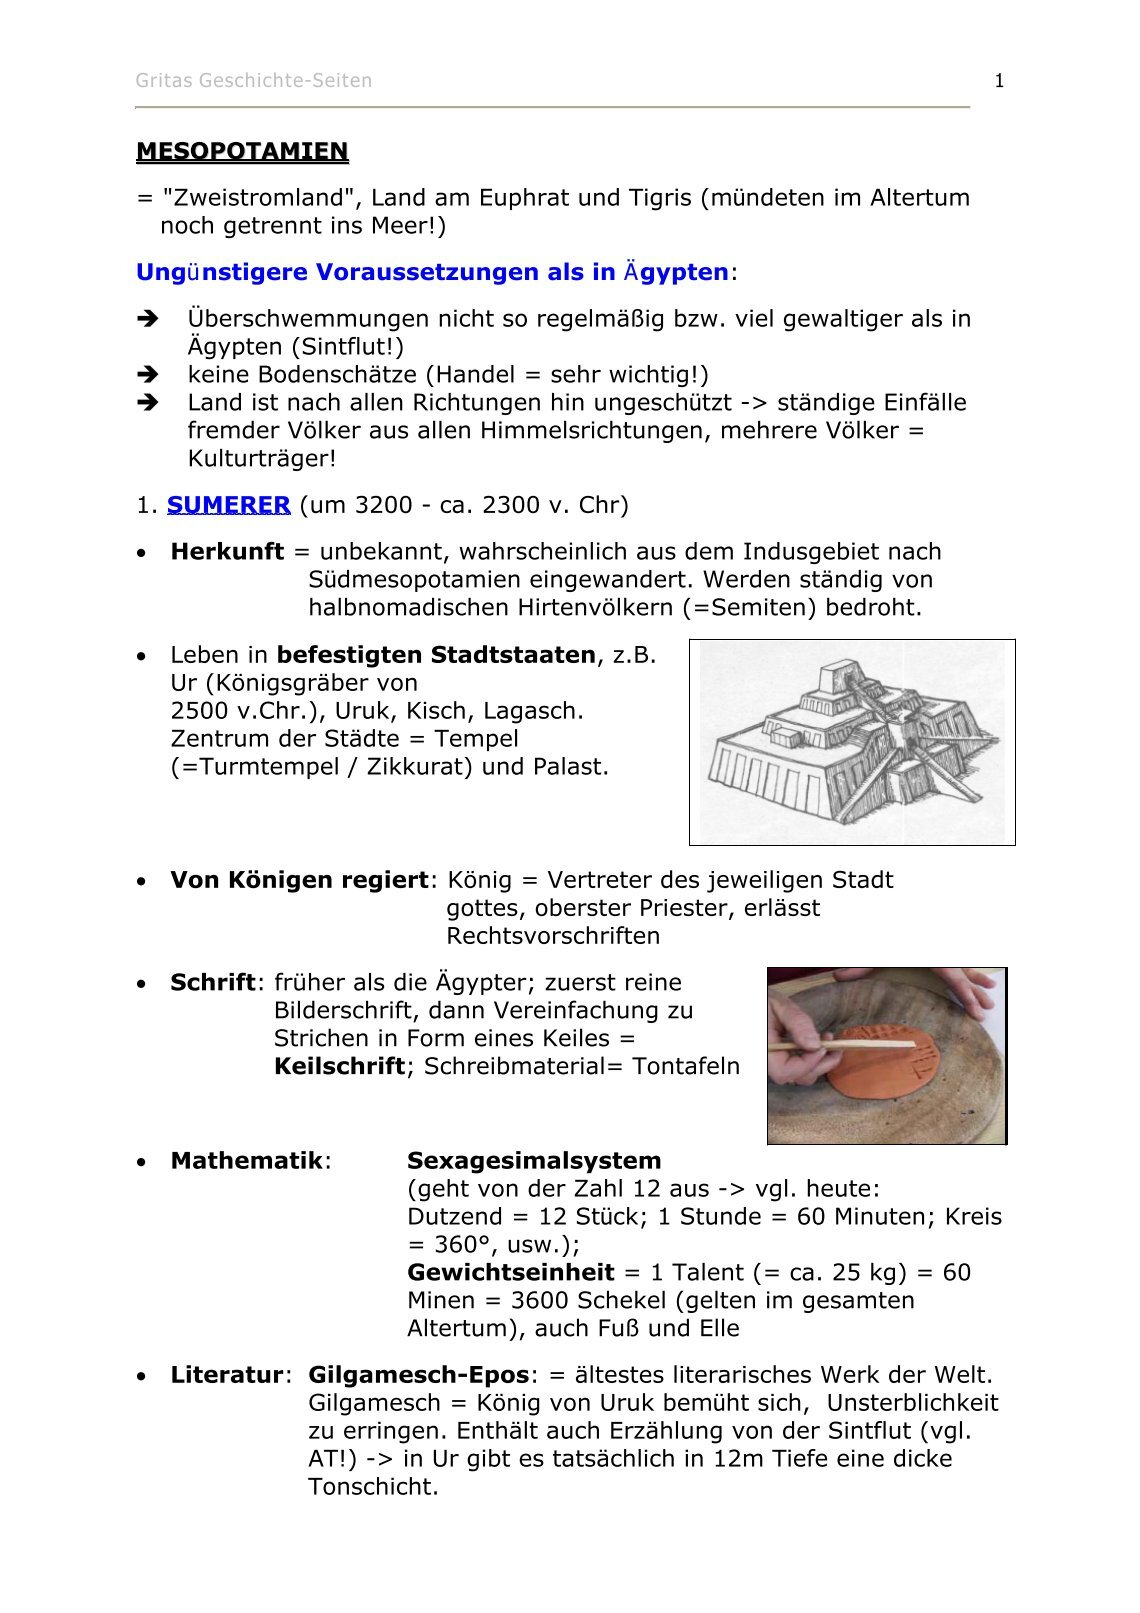 Atemberaubend Gilgamesch Epos Arbeitsblatt Galerie - Mathe ...